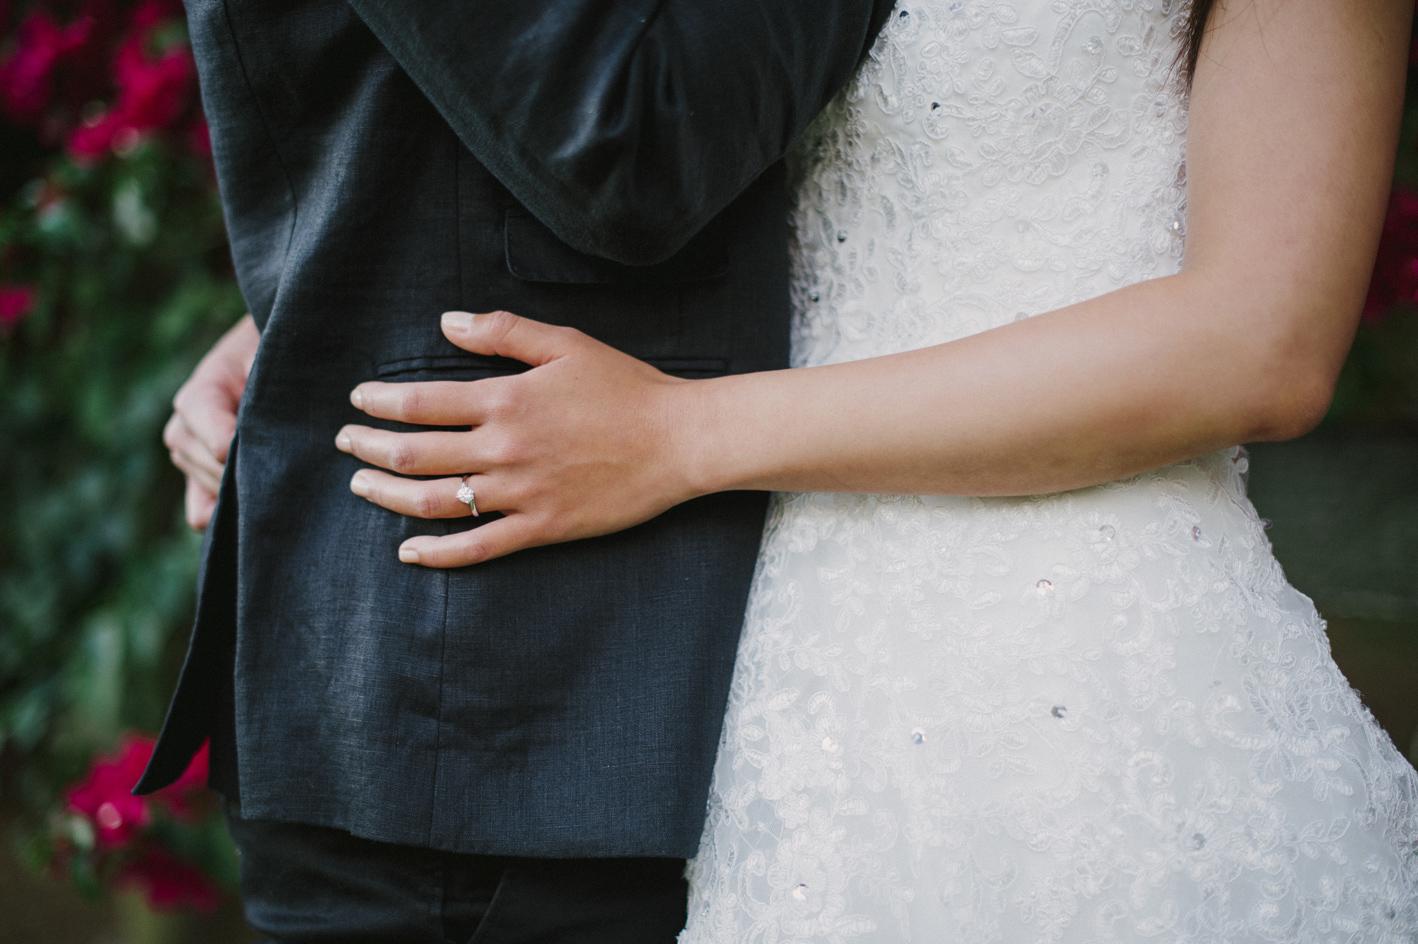 019-ed-janet-currumbin-wedding_sophie-baker-photography